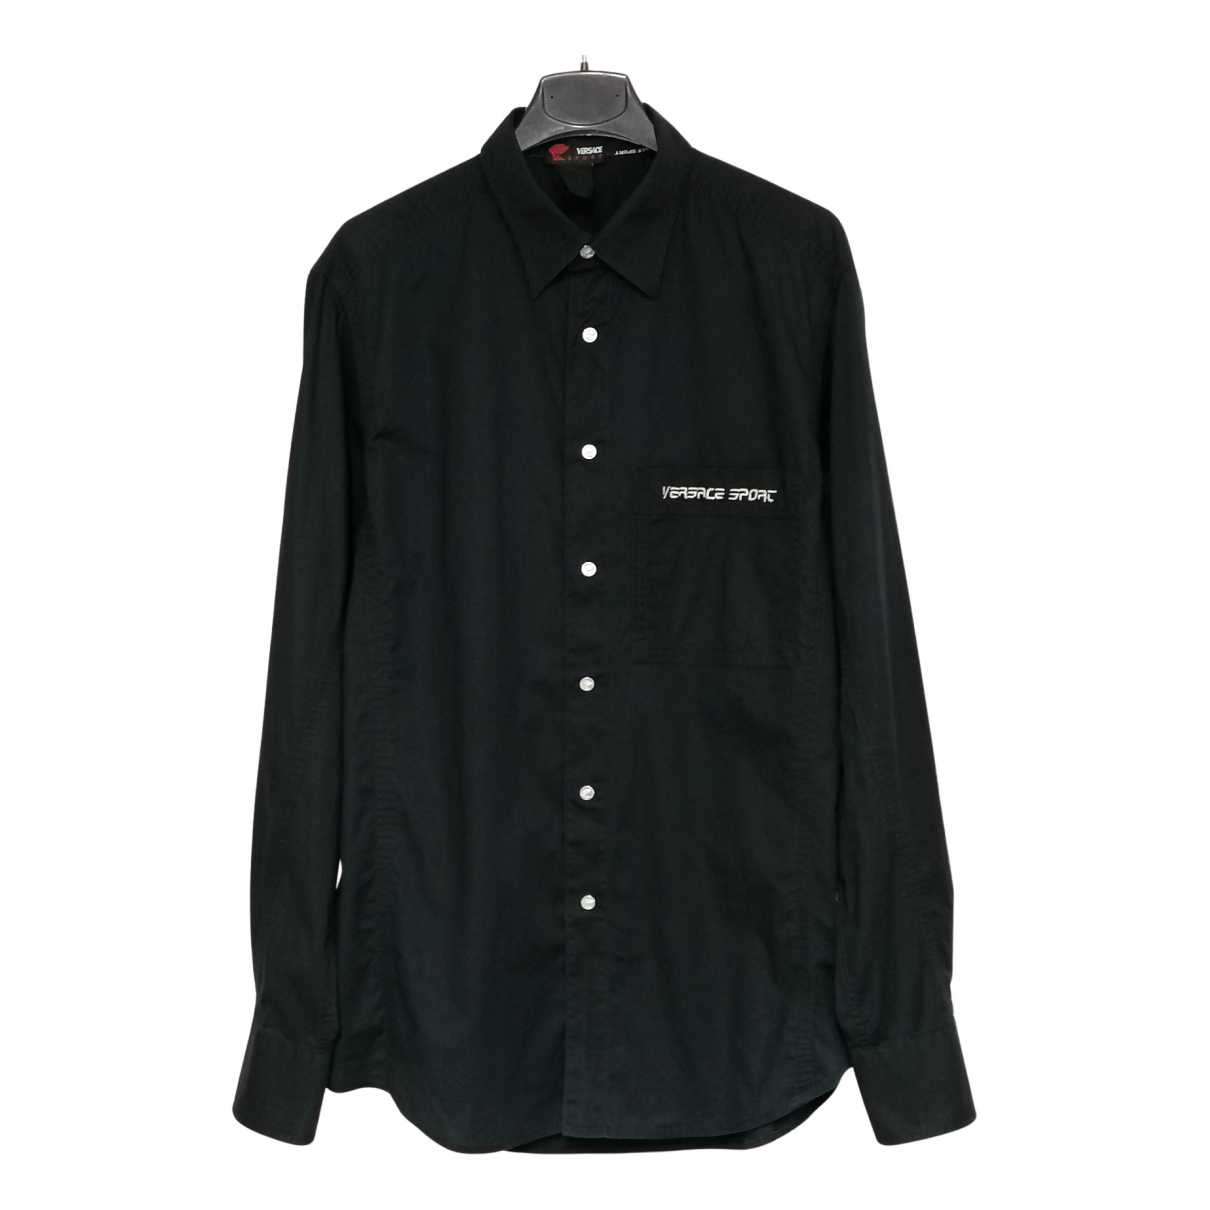 Versace Jeans N Black Cotton Shirts for Men M International